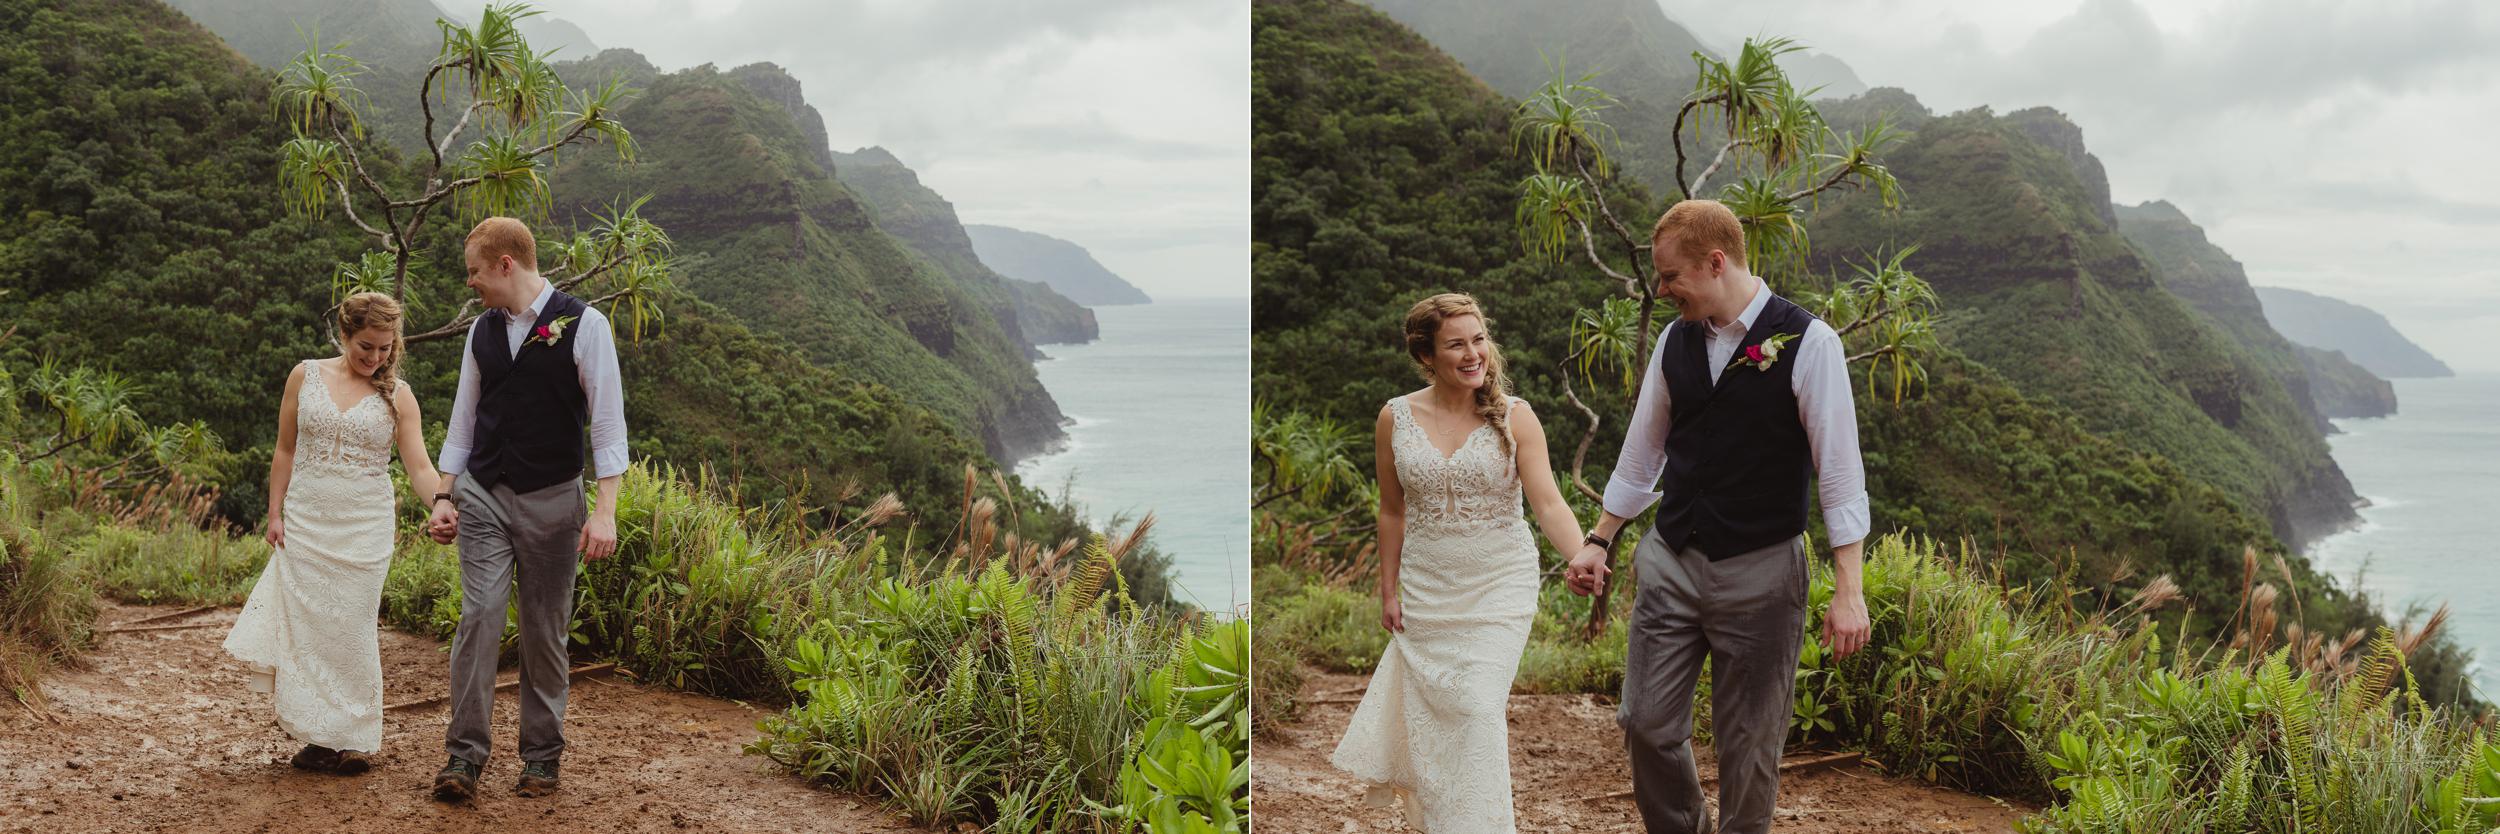 62-kauai-destination-wedding-photographer-vivianchen-0396_WEB.jpg